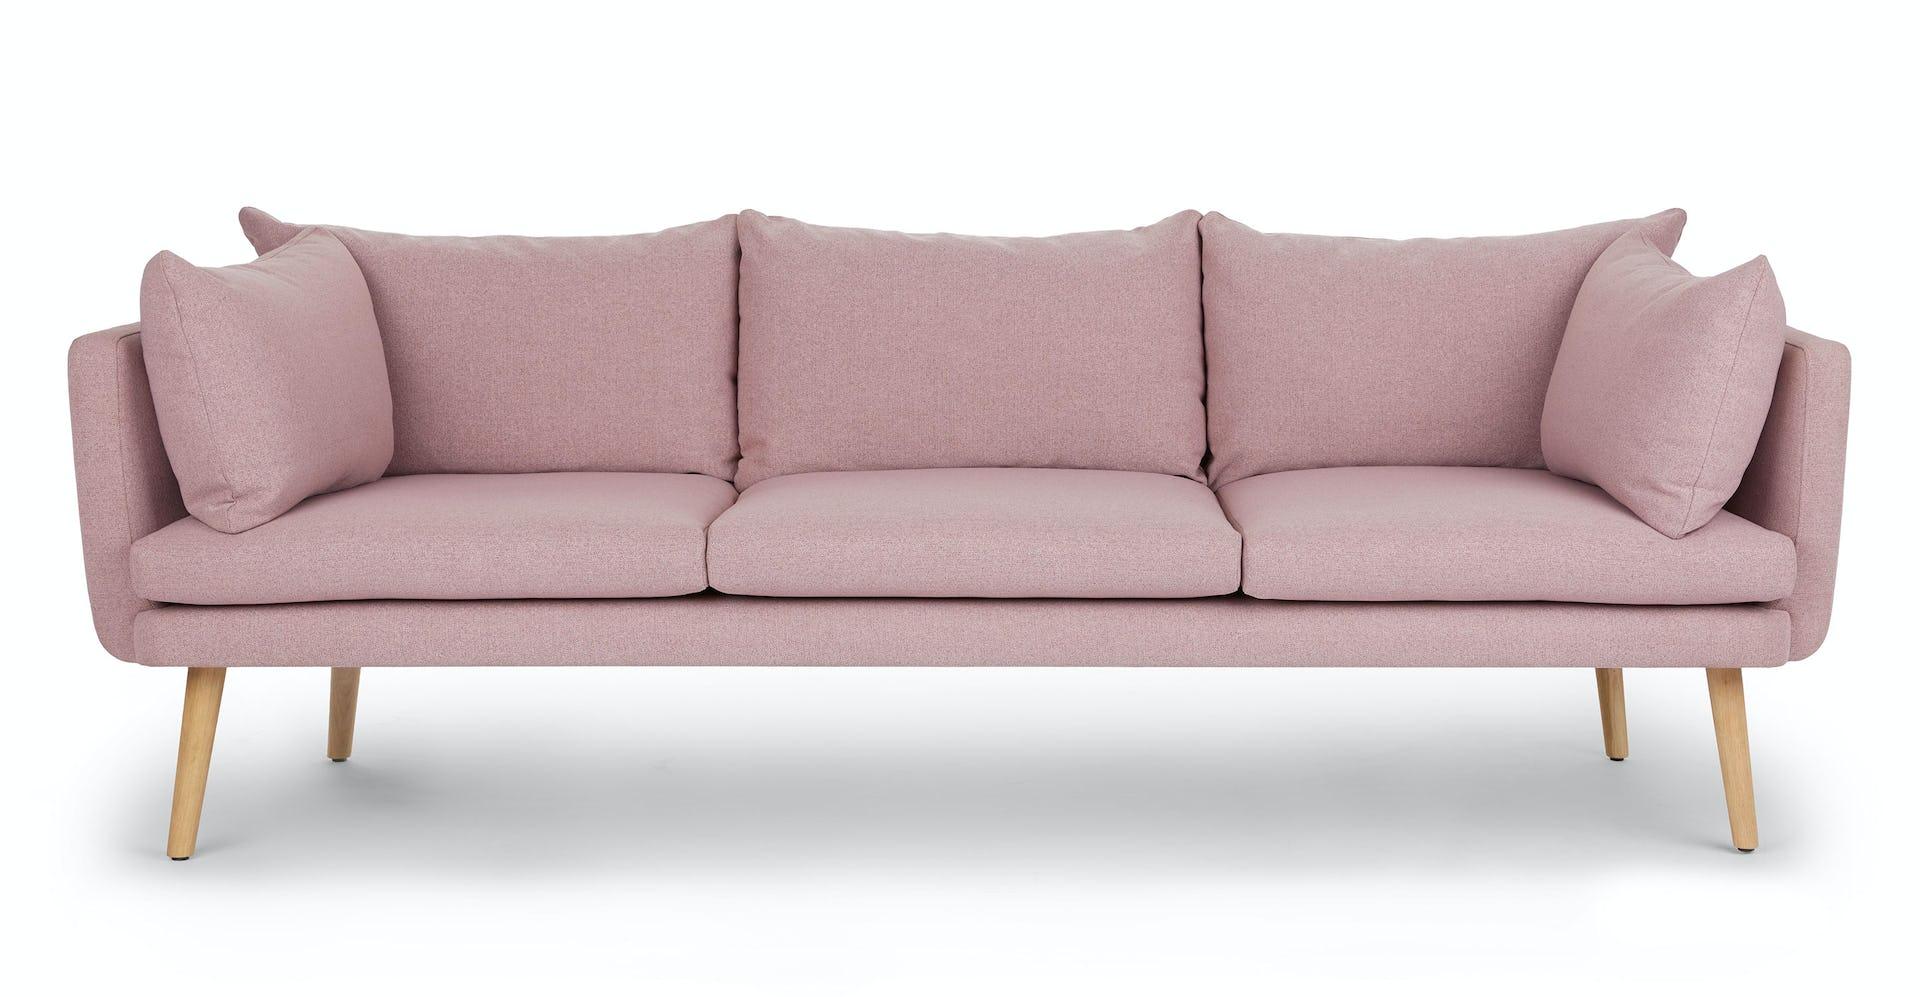 Blossom Pink Celsa 3 Seater Fabric Sofa